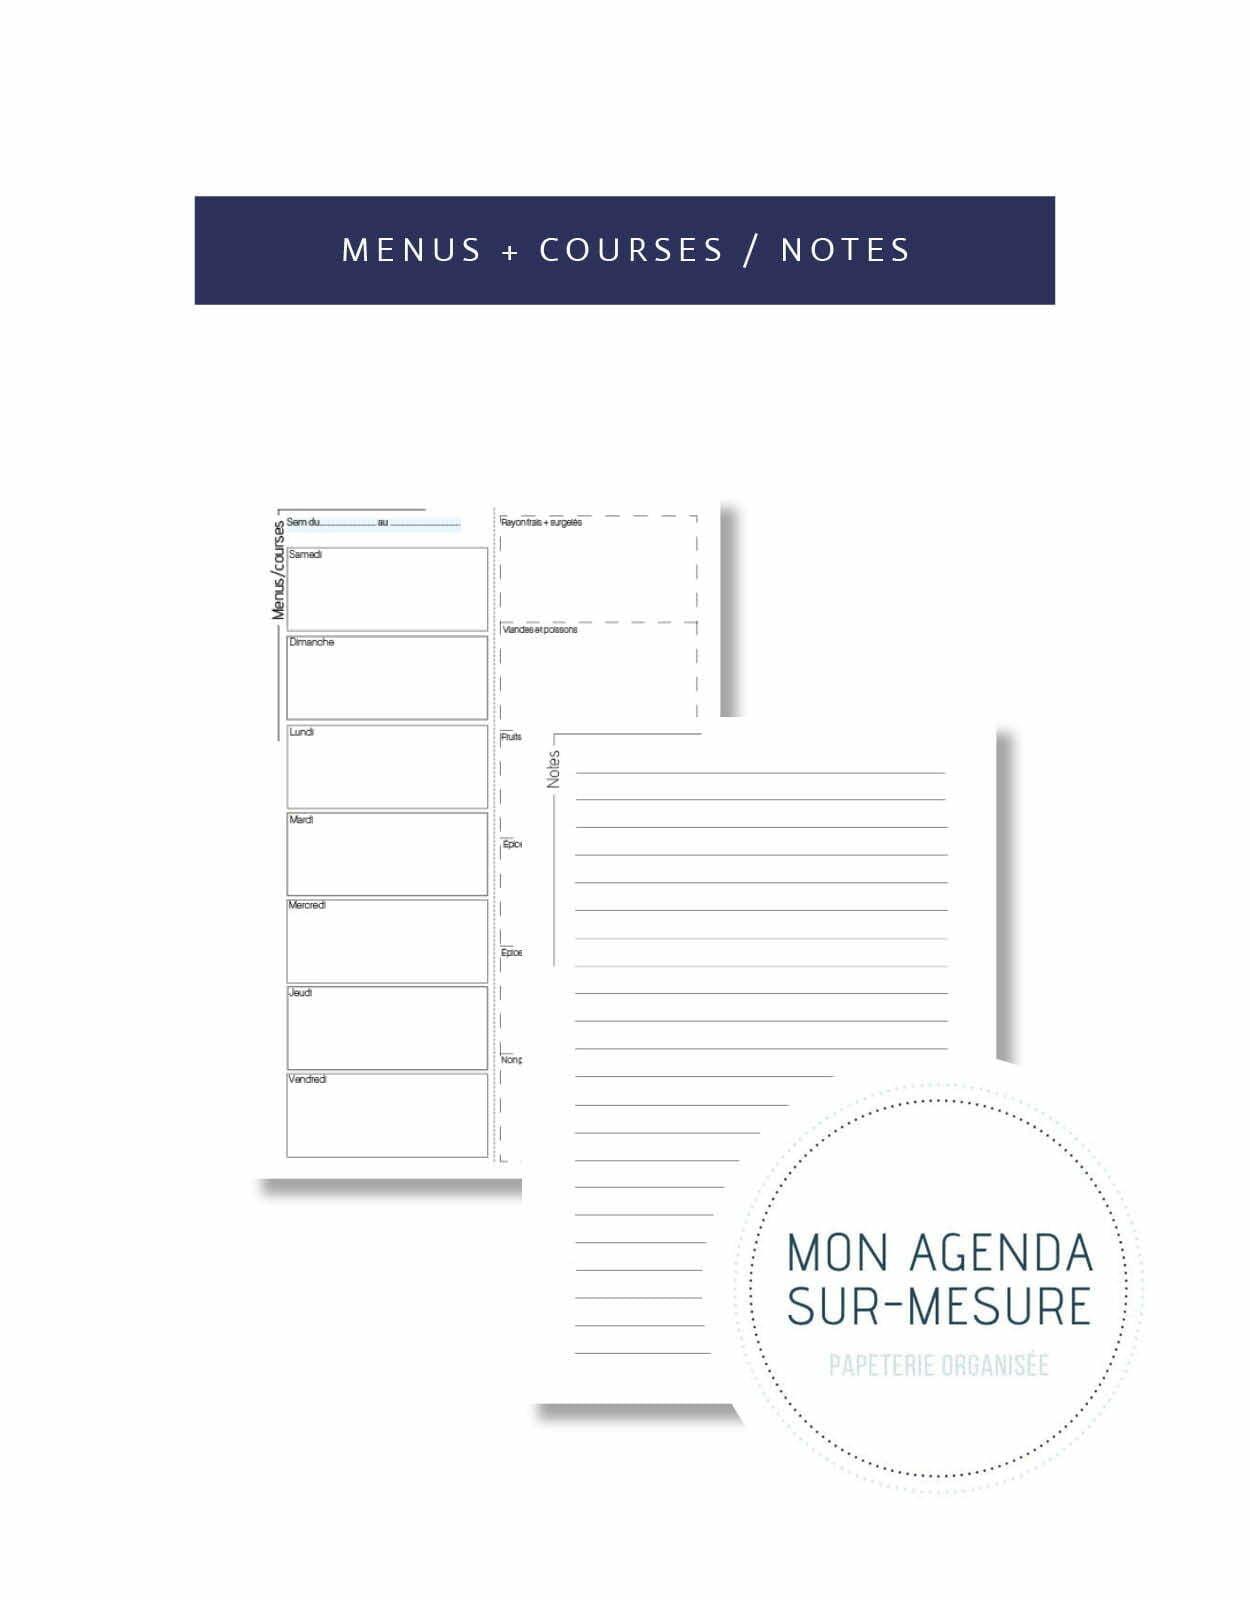 page-agenda-sur-mesure-menus-semaine-courses-notes